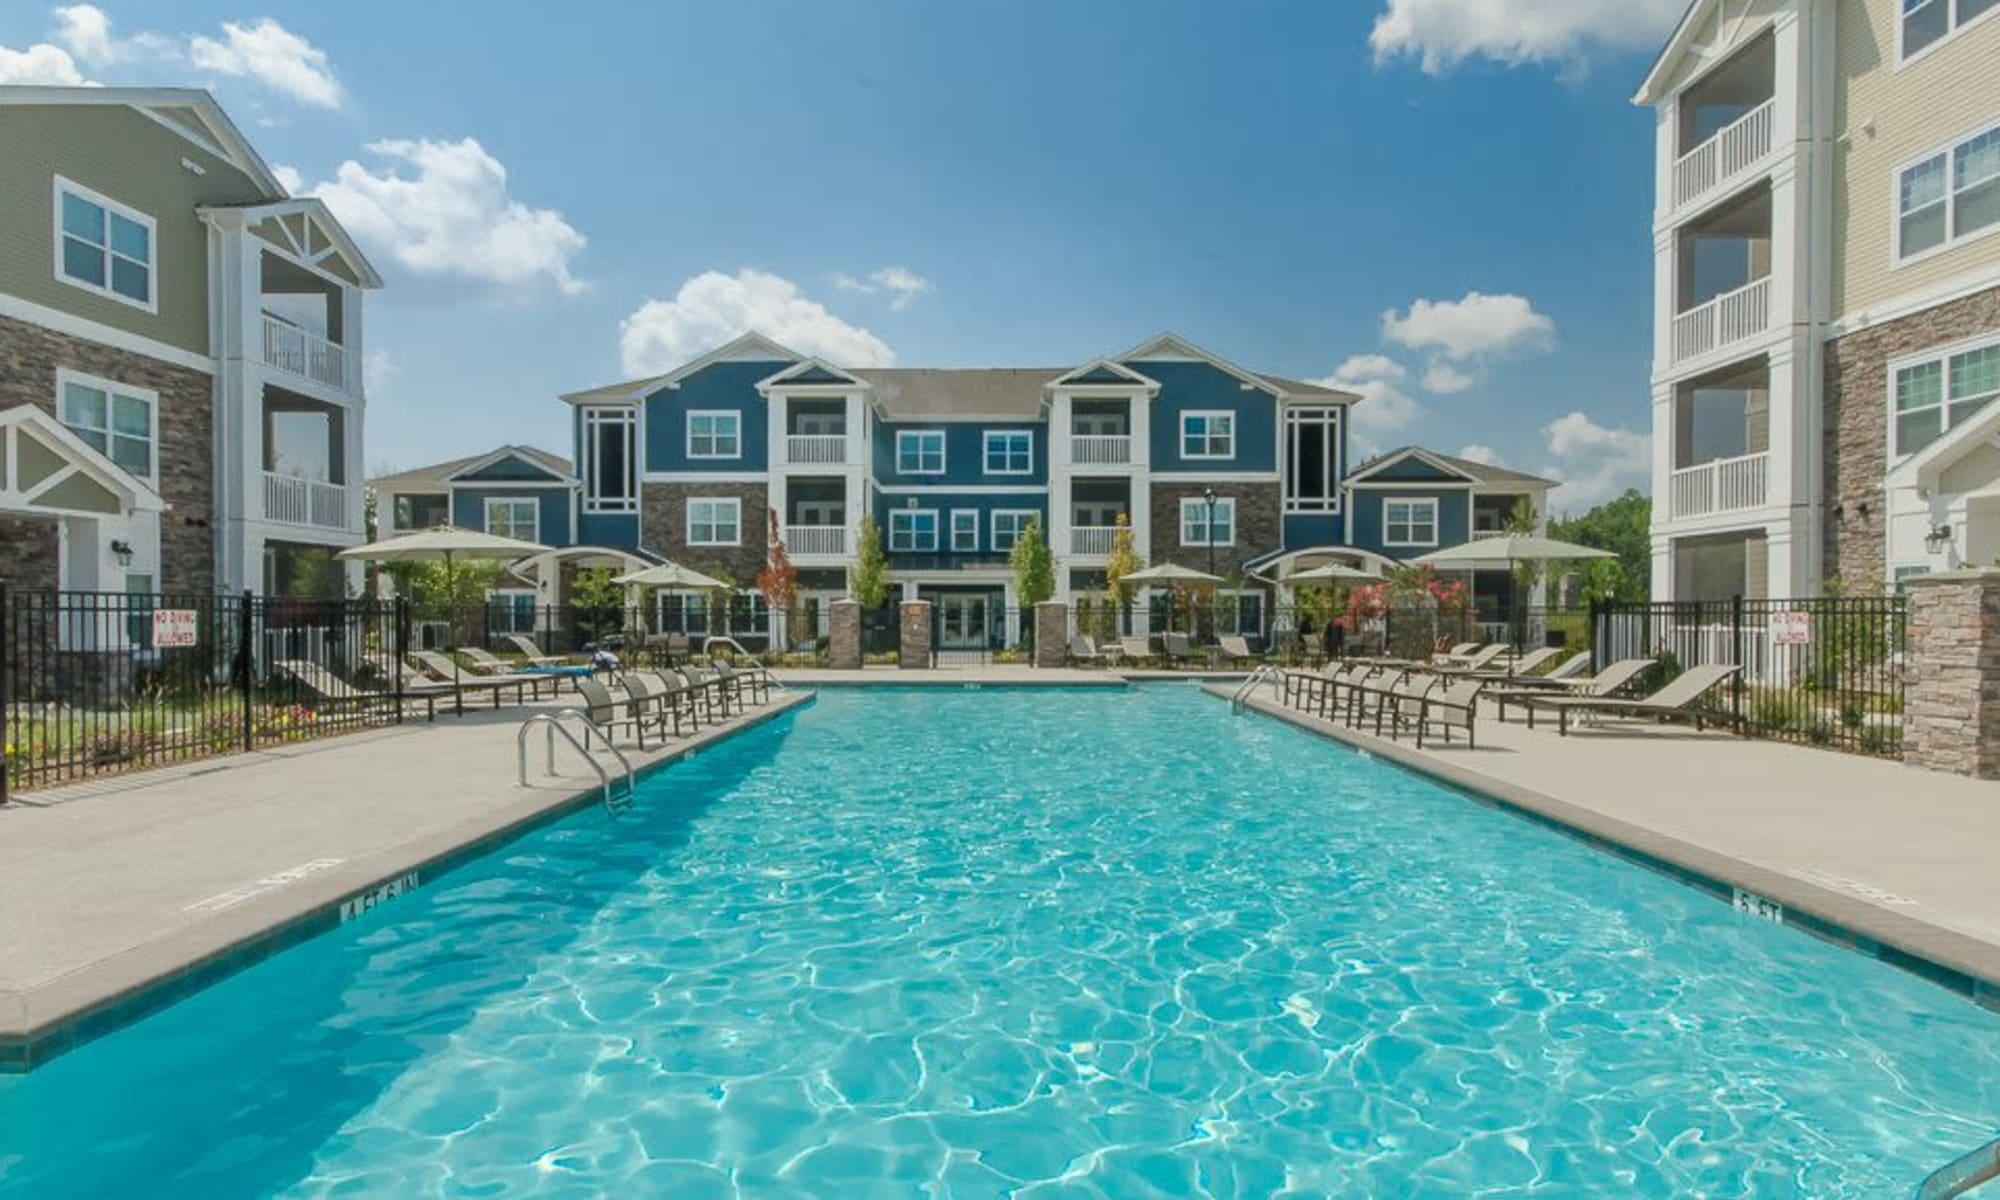 Oasis at Montclair Apartments apartments in Dumfries, VA